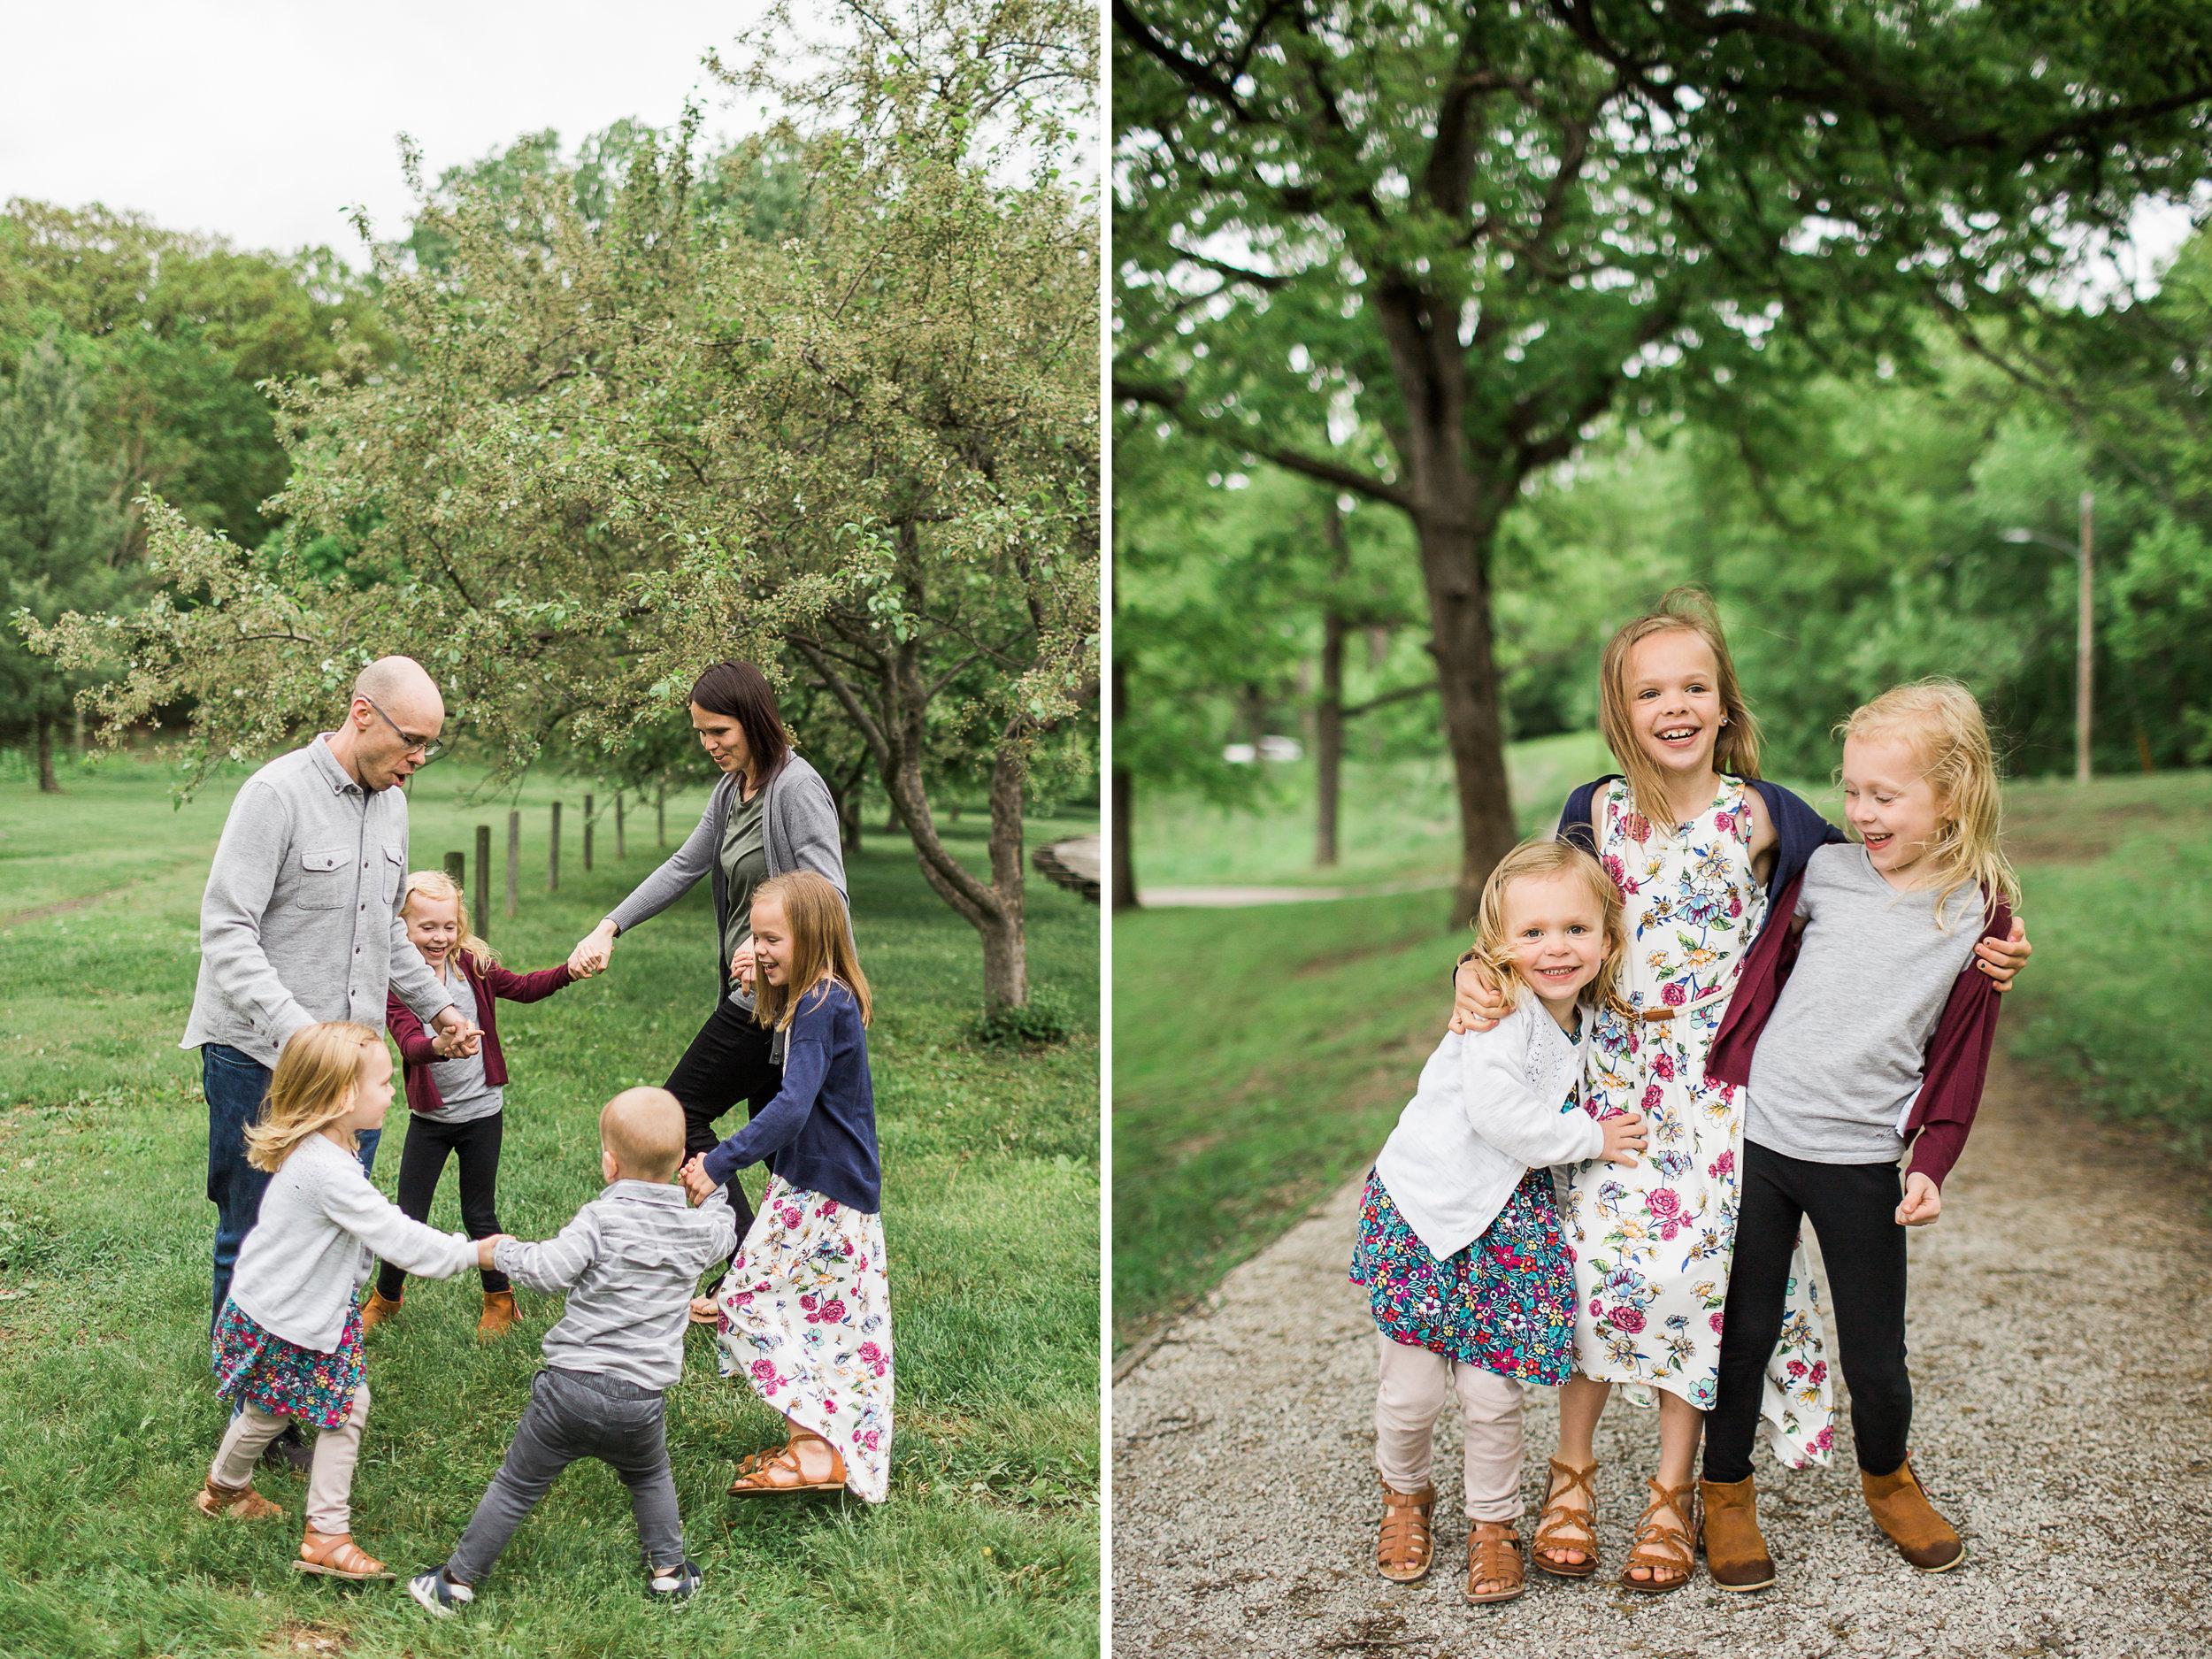 greenwoodparkfamilysession-3.jpg